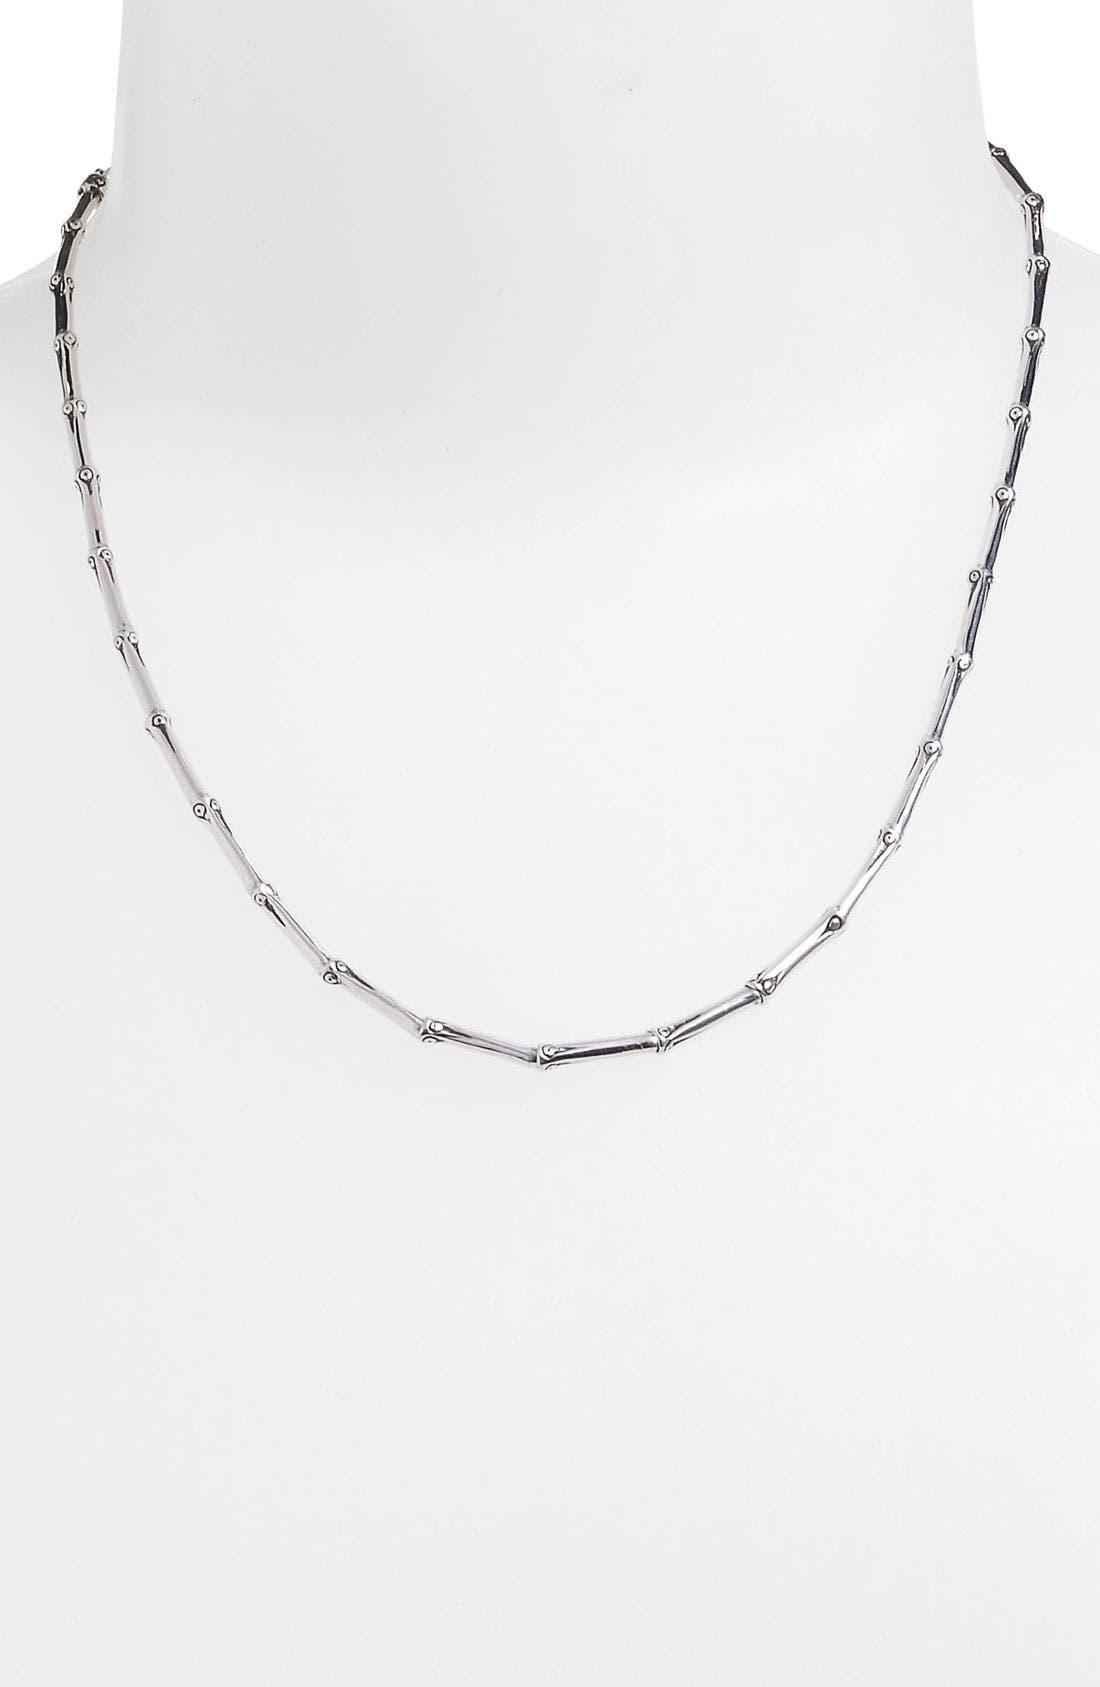 Alternate Image 1 Selected - John Hardy 'Bamboo' Single Row Necklace